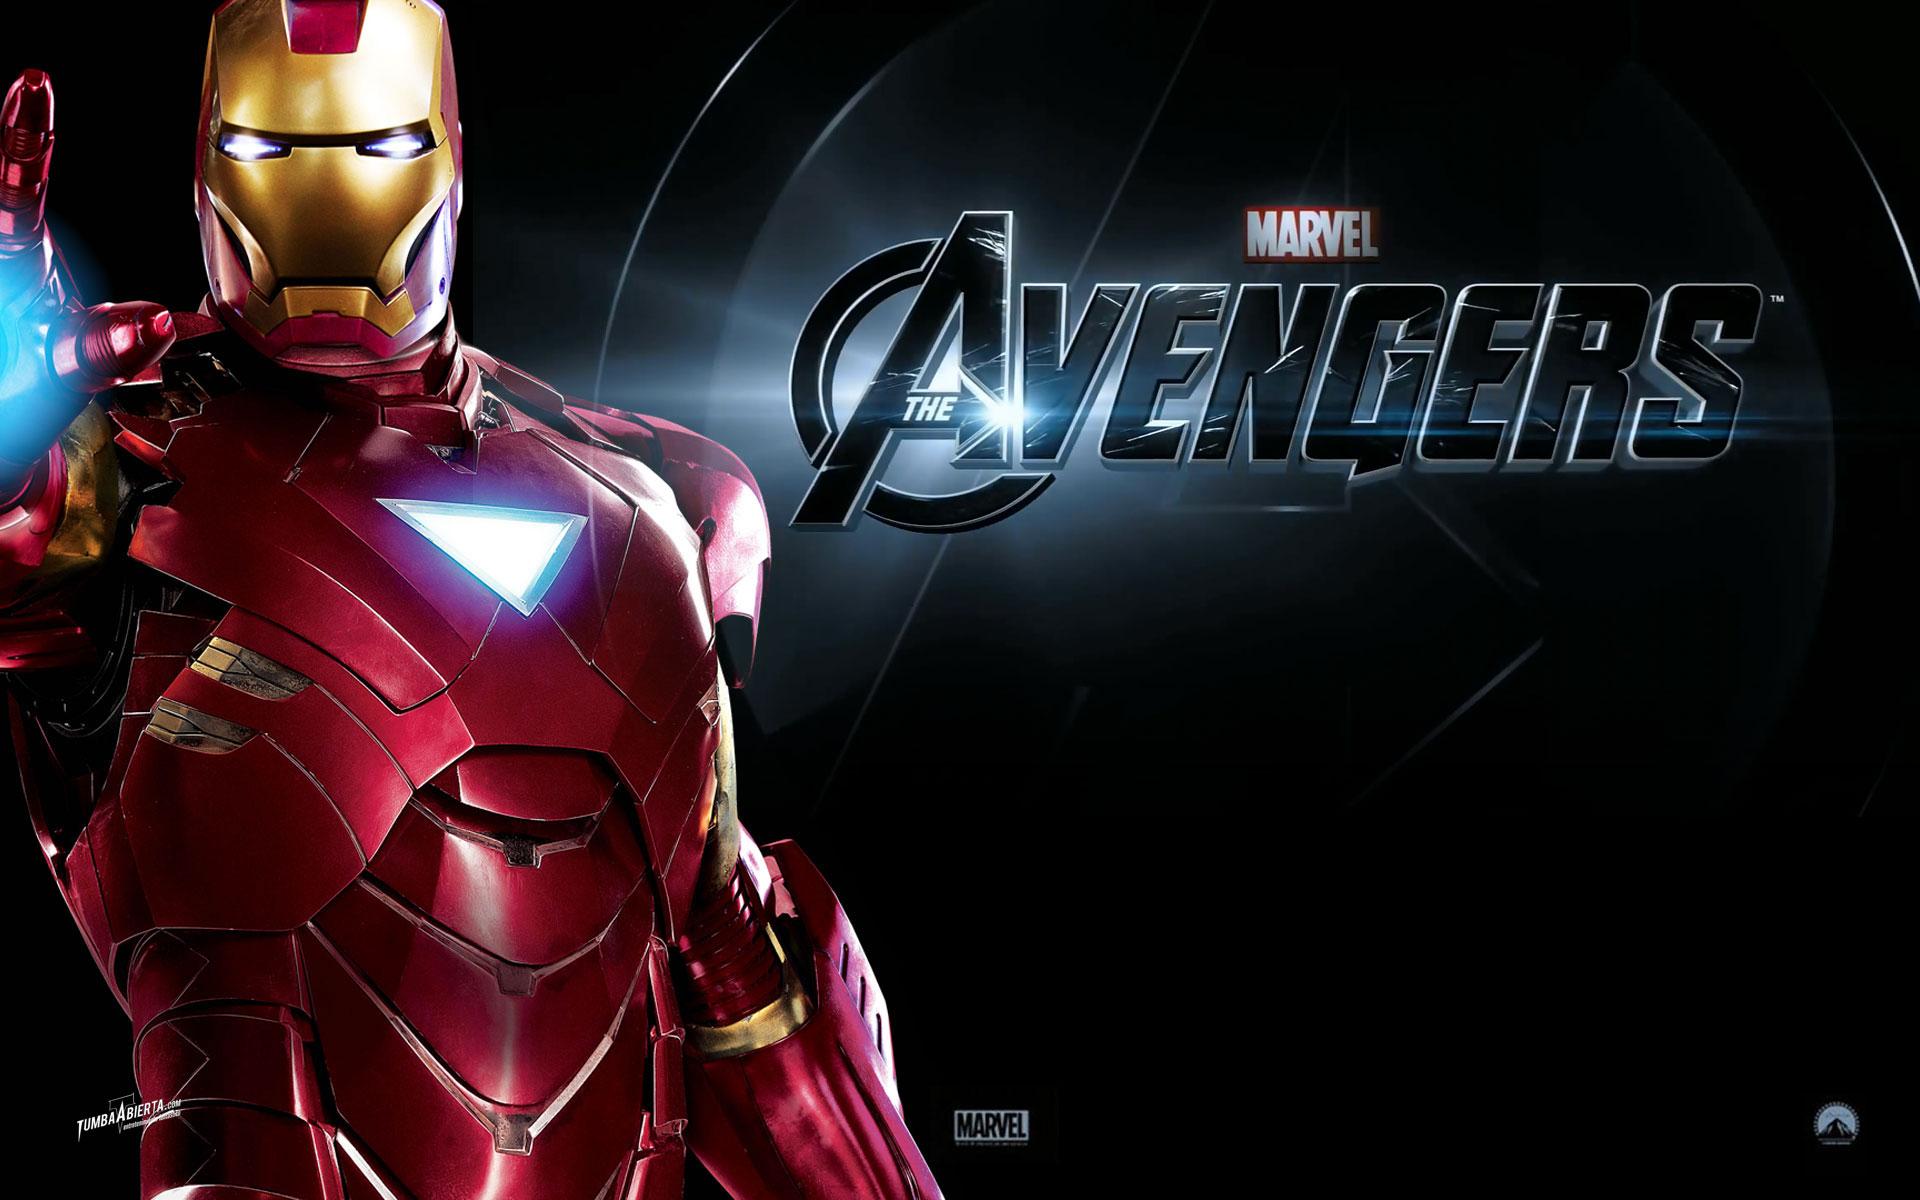 Wallpaper Marvel The Avengers Los Vengadores